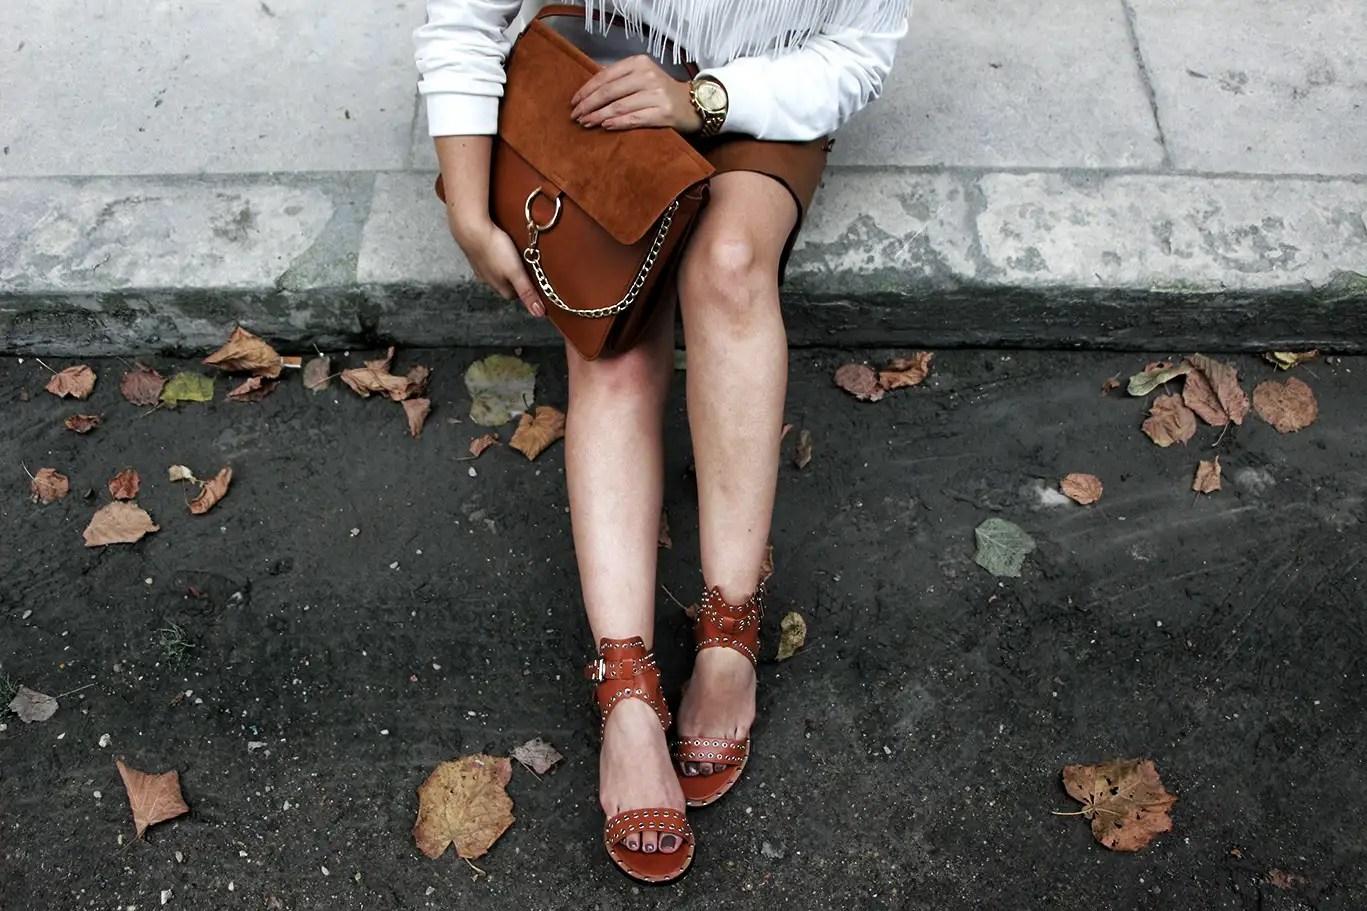 caramel, sweat franges, sweat femme, jupe similicuir, sandales inspiration isabelle marant, sac inspiration faye chloé, casquette femme, saint james, sheinside, morgan, sandales shein, faye chloé